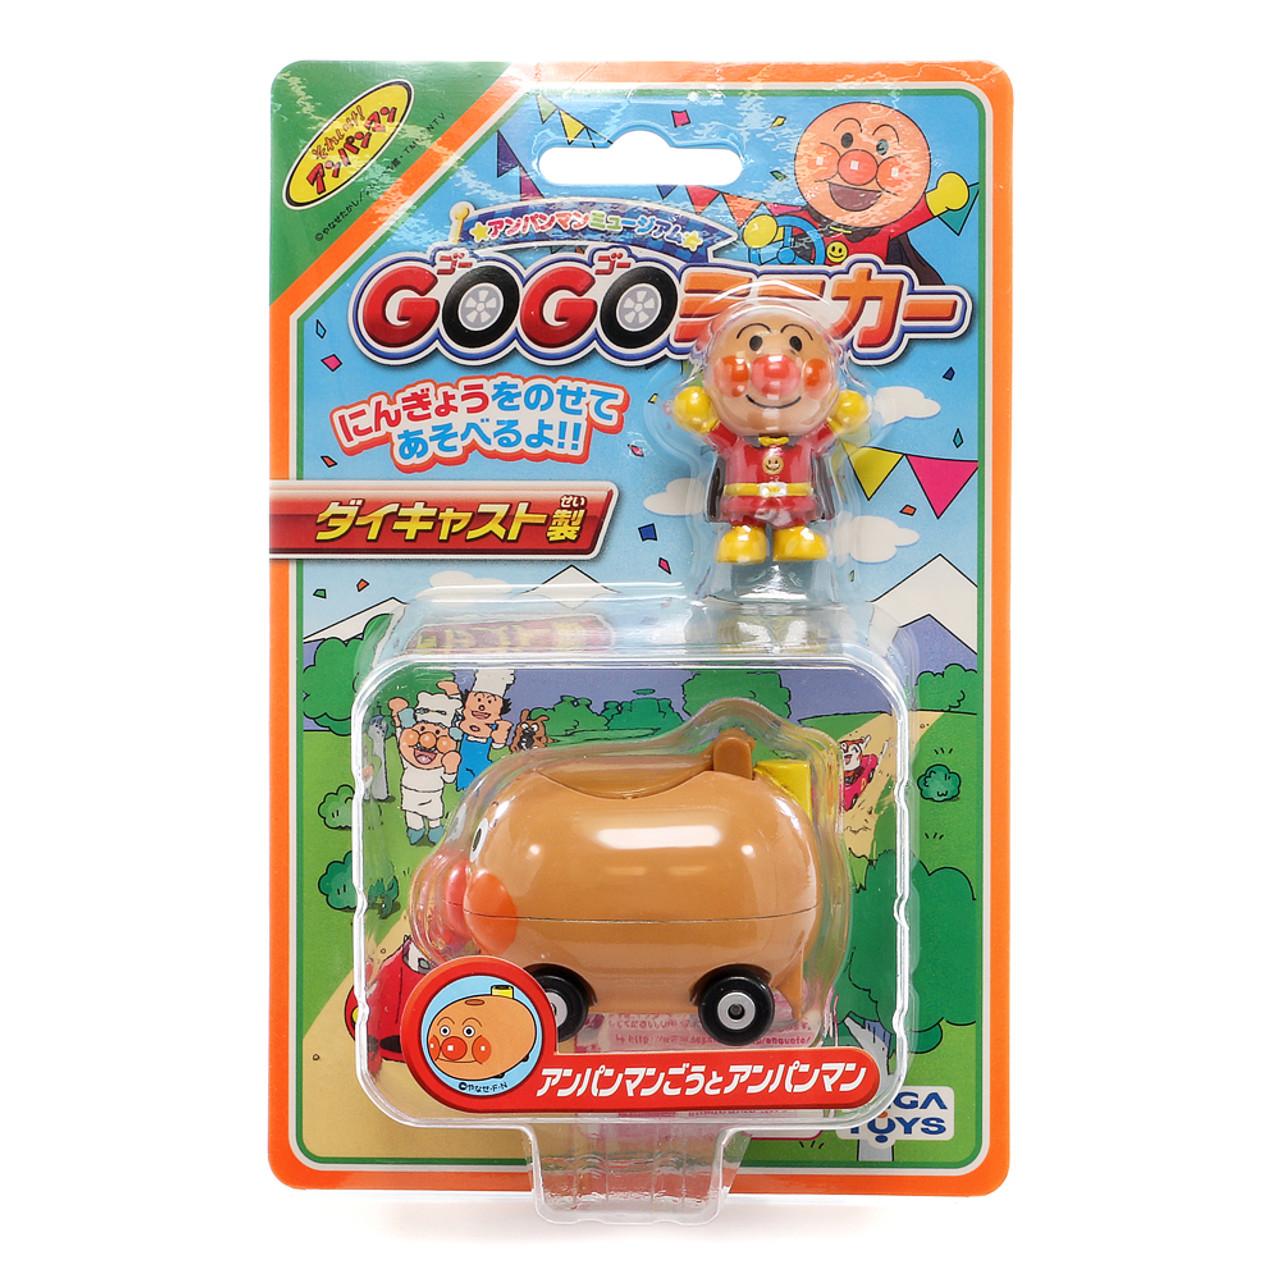 Sega Toys Anpanman Museum Go Go Mini Vehicle Carry Hero - Anpanman Car ( Complete Packing )